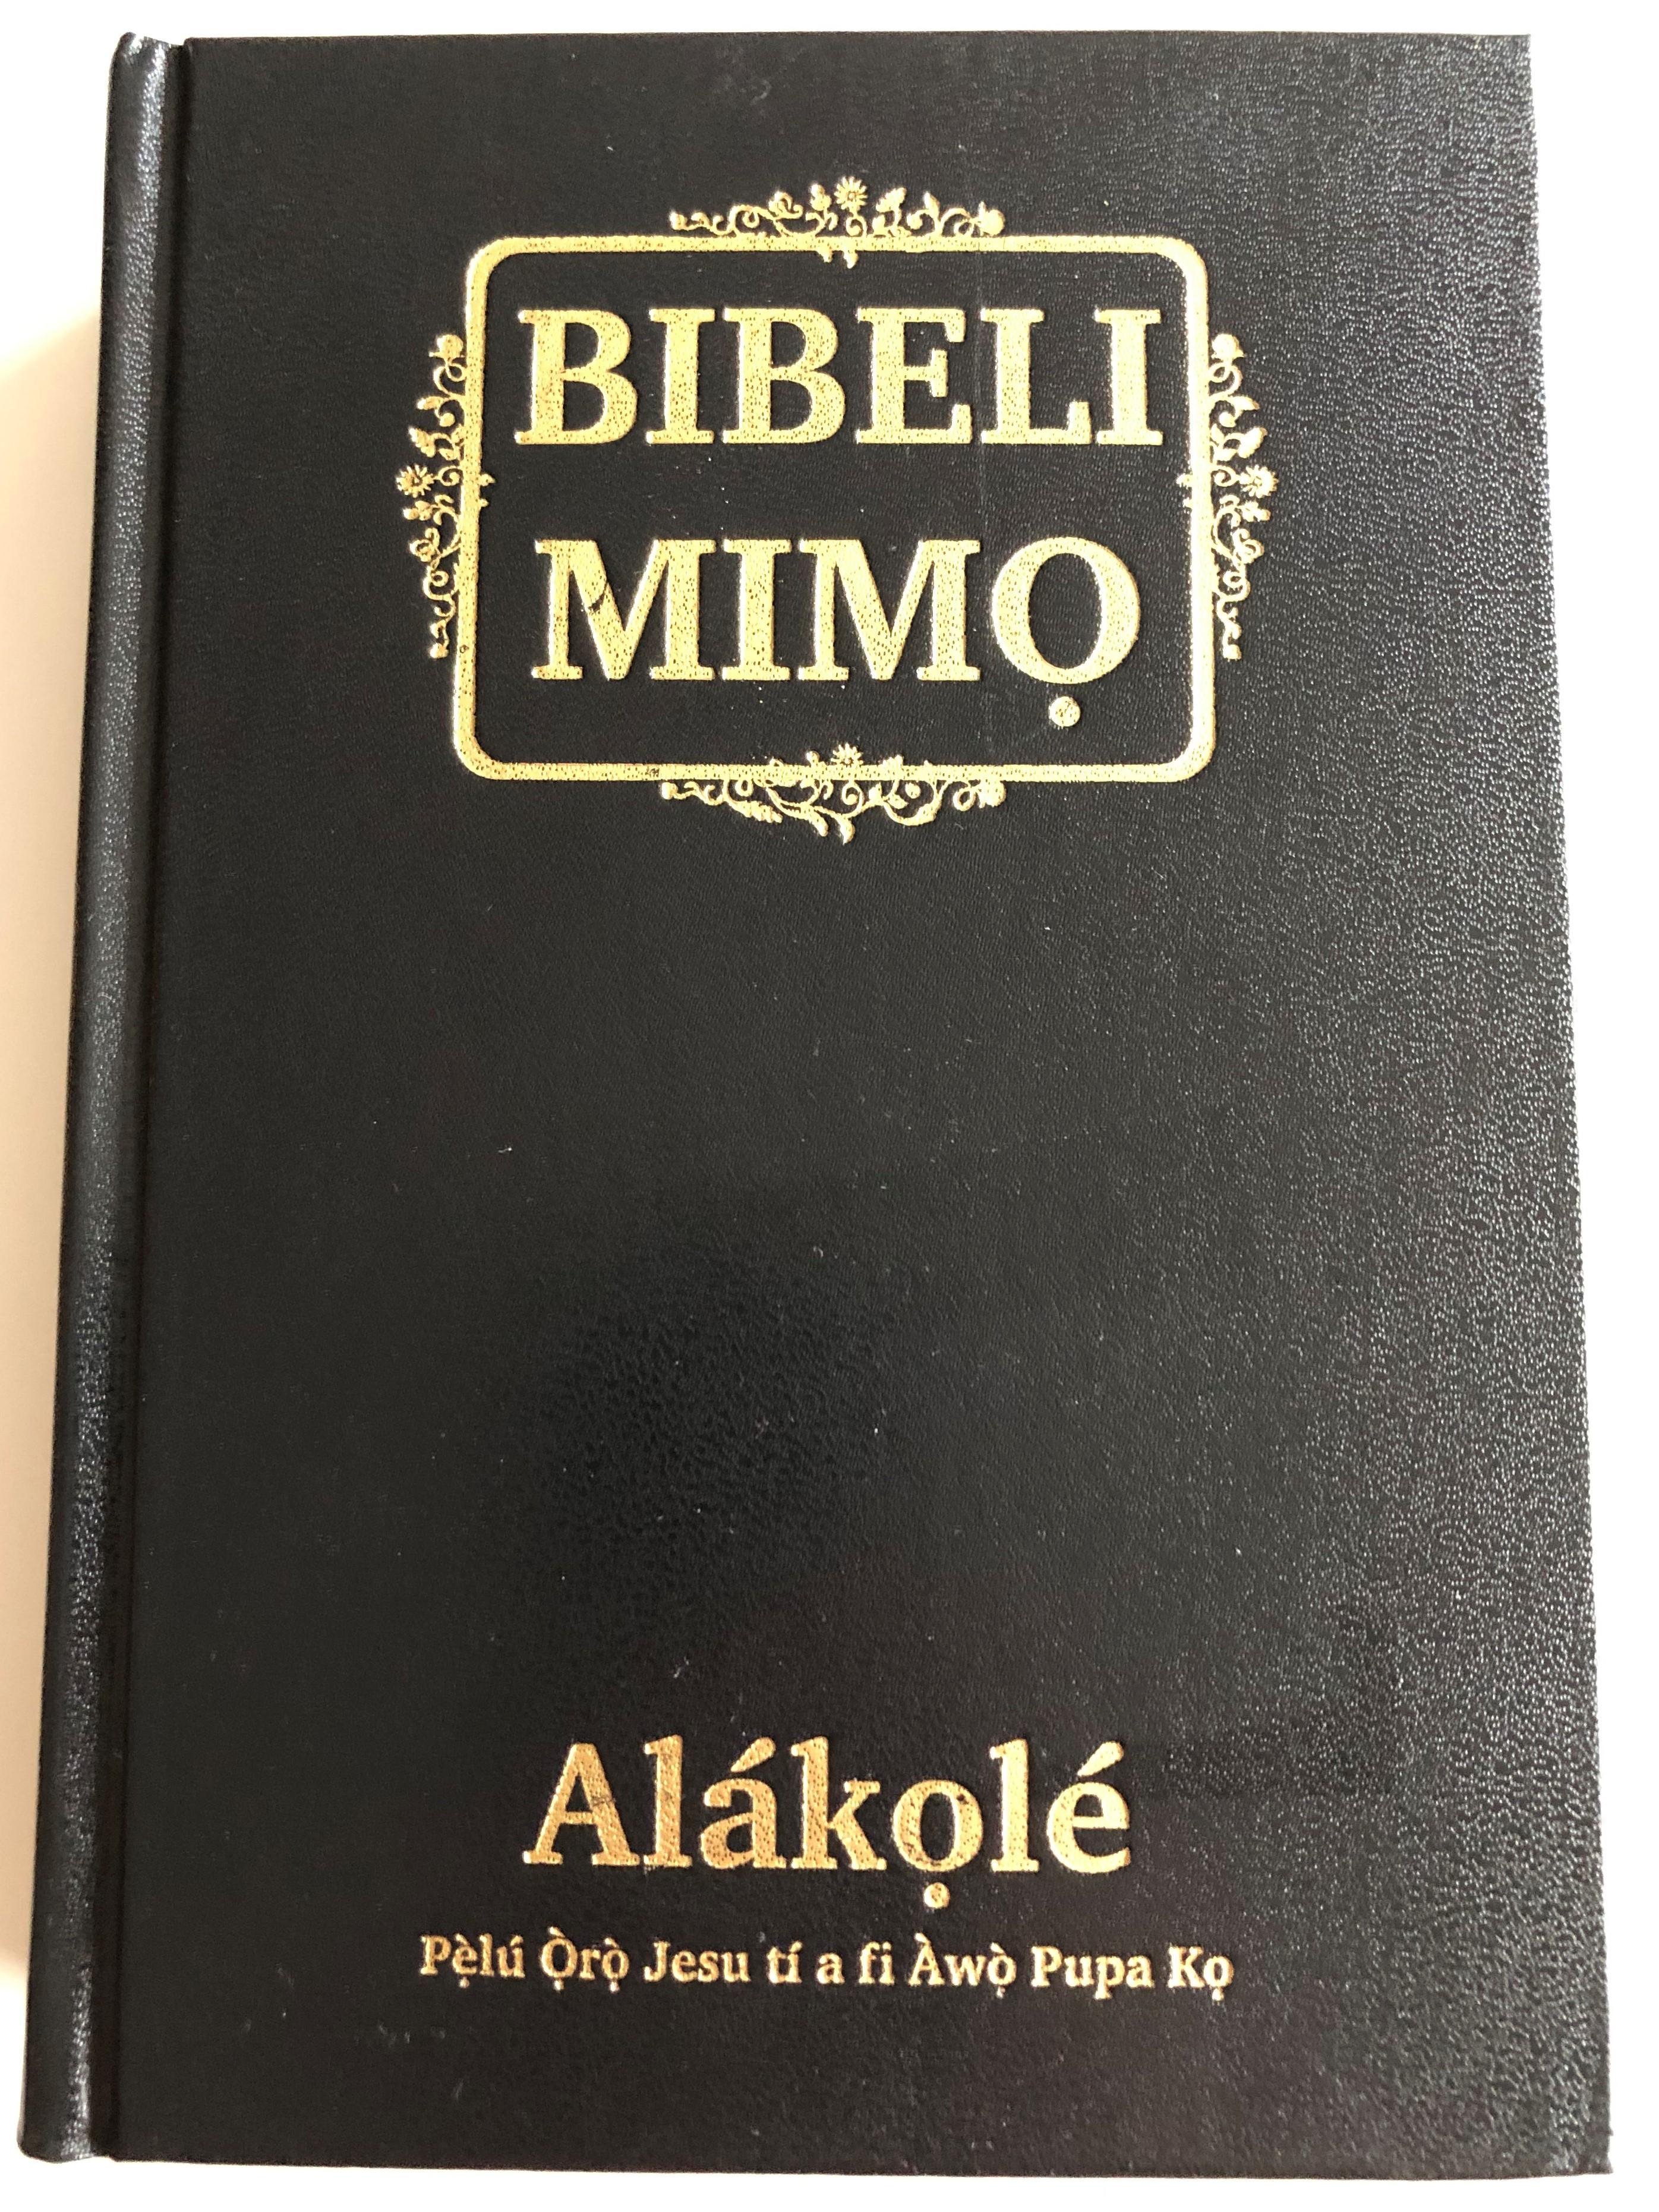 bibeli-mimo-al-kol-yoruba-language-holy-bible-1.jpg